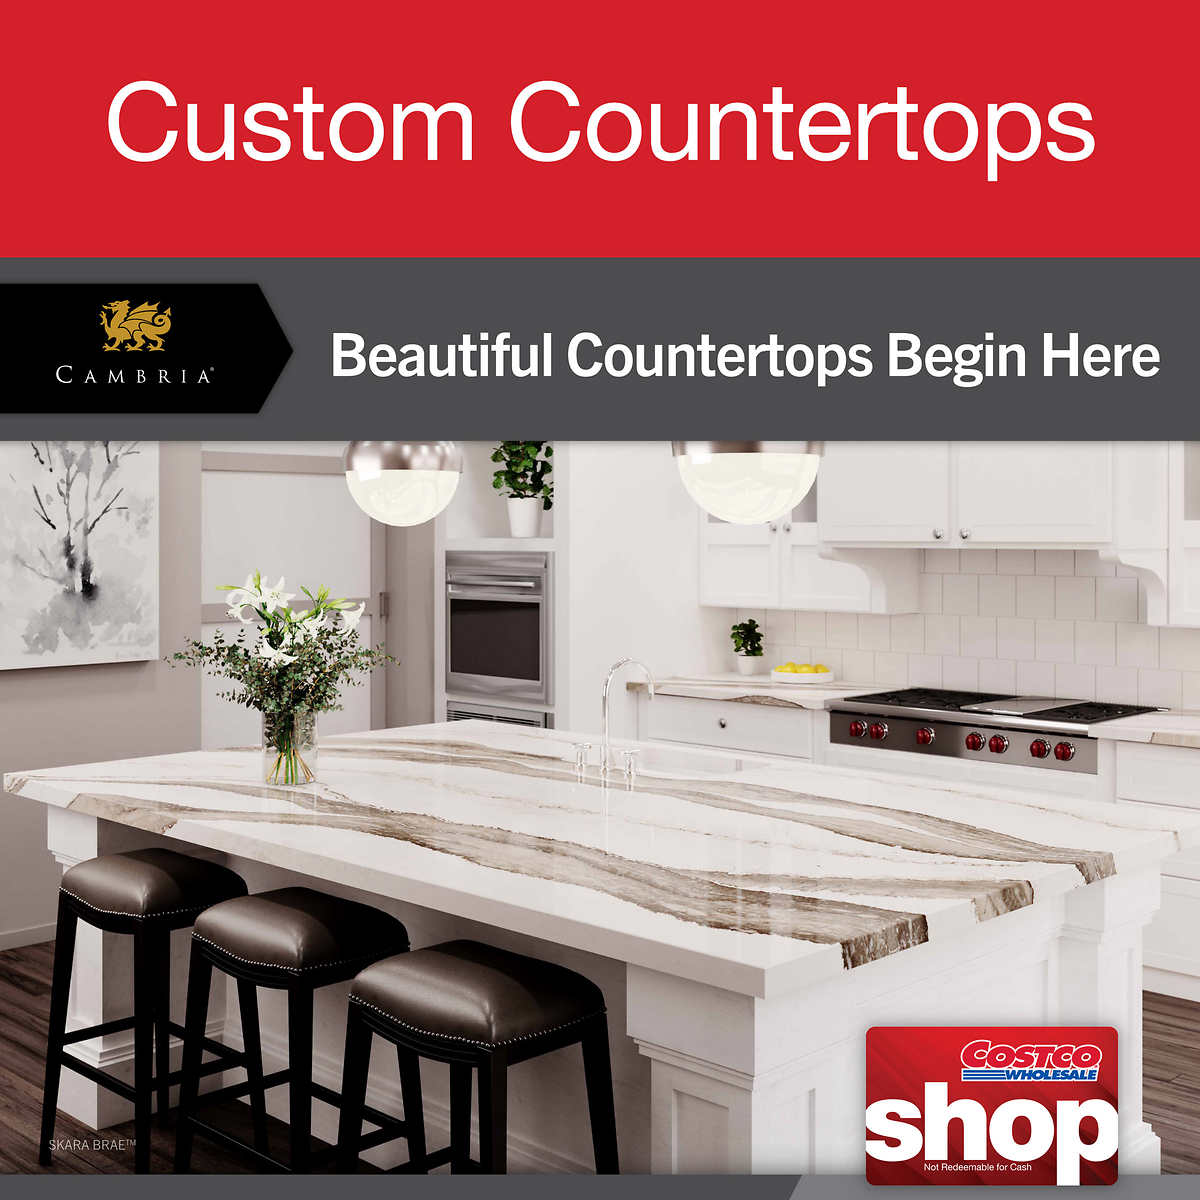 Cambria Custom Countertops